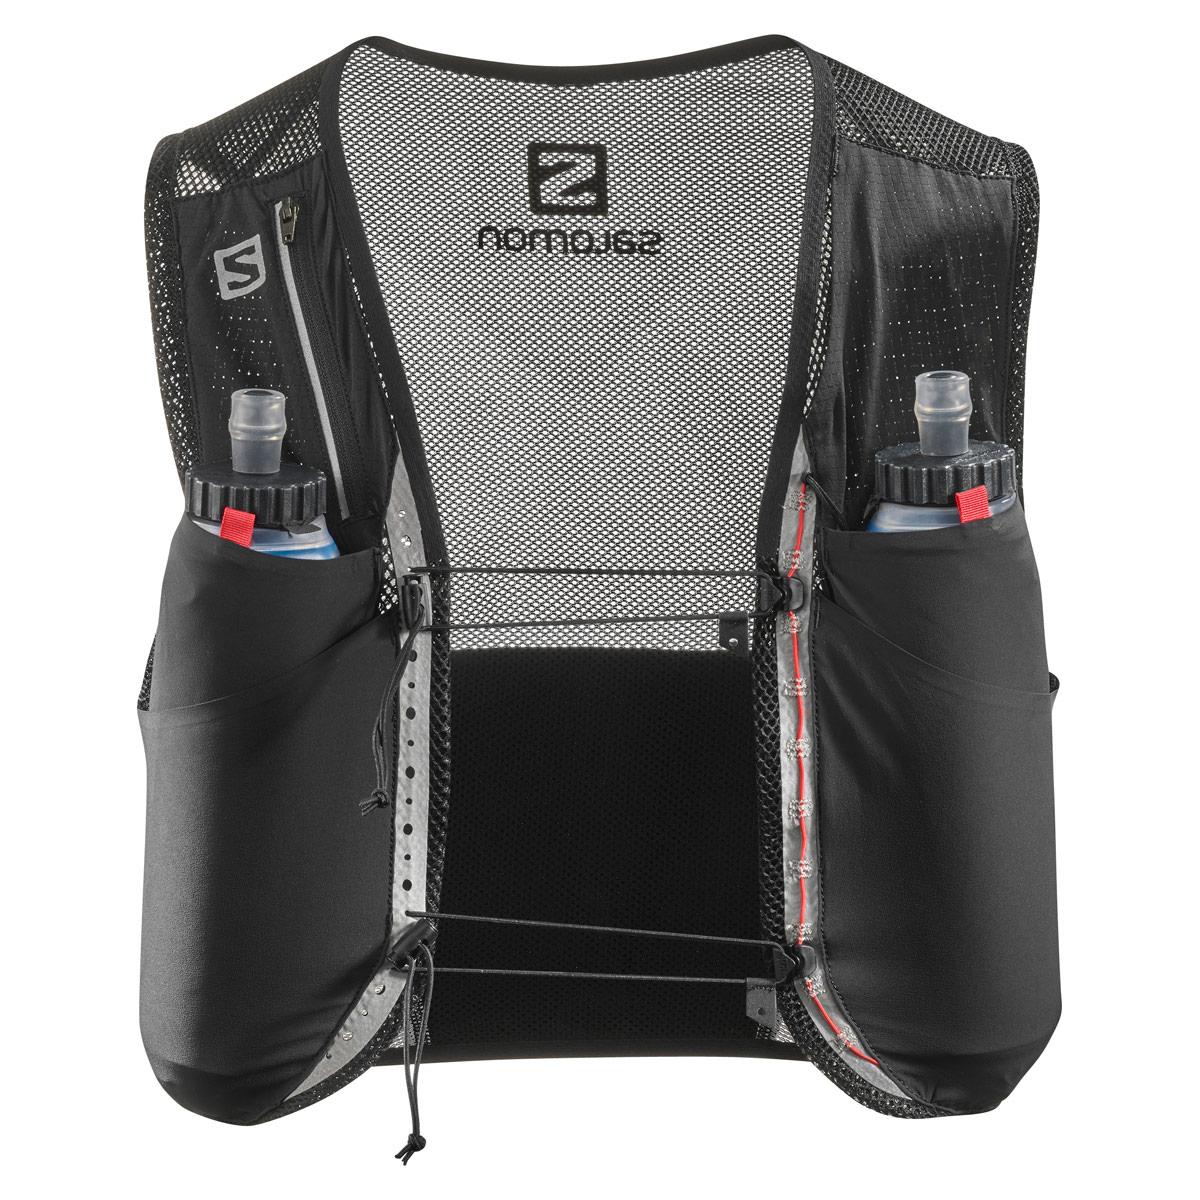 best service 695d4 adaed Salomon S-Lab Sense 2 Set - Backpacks - Black